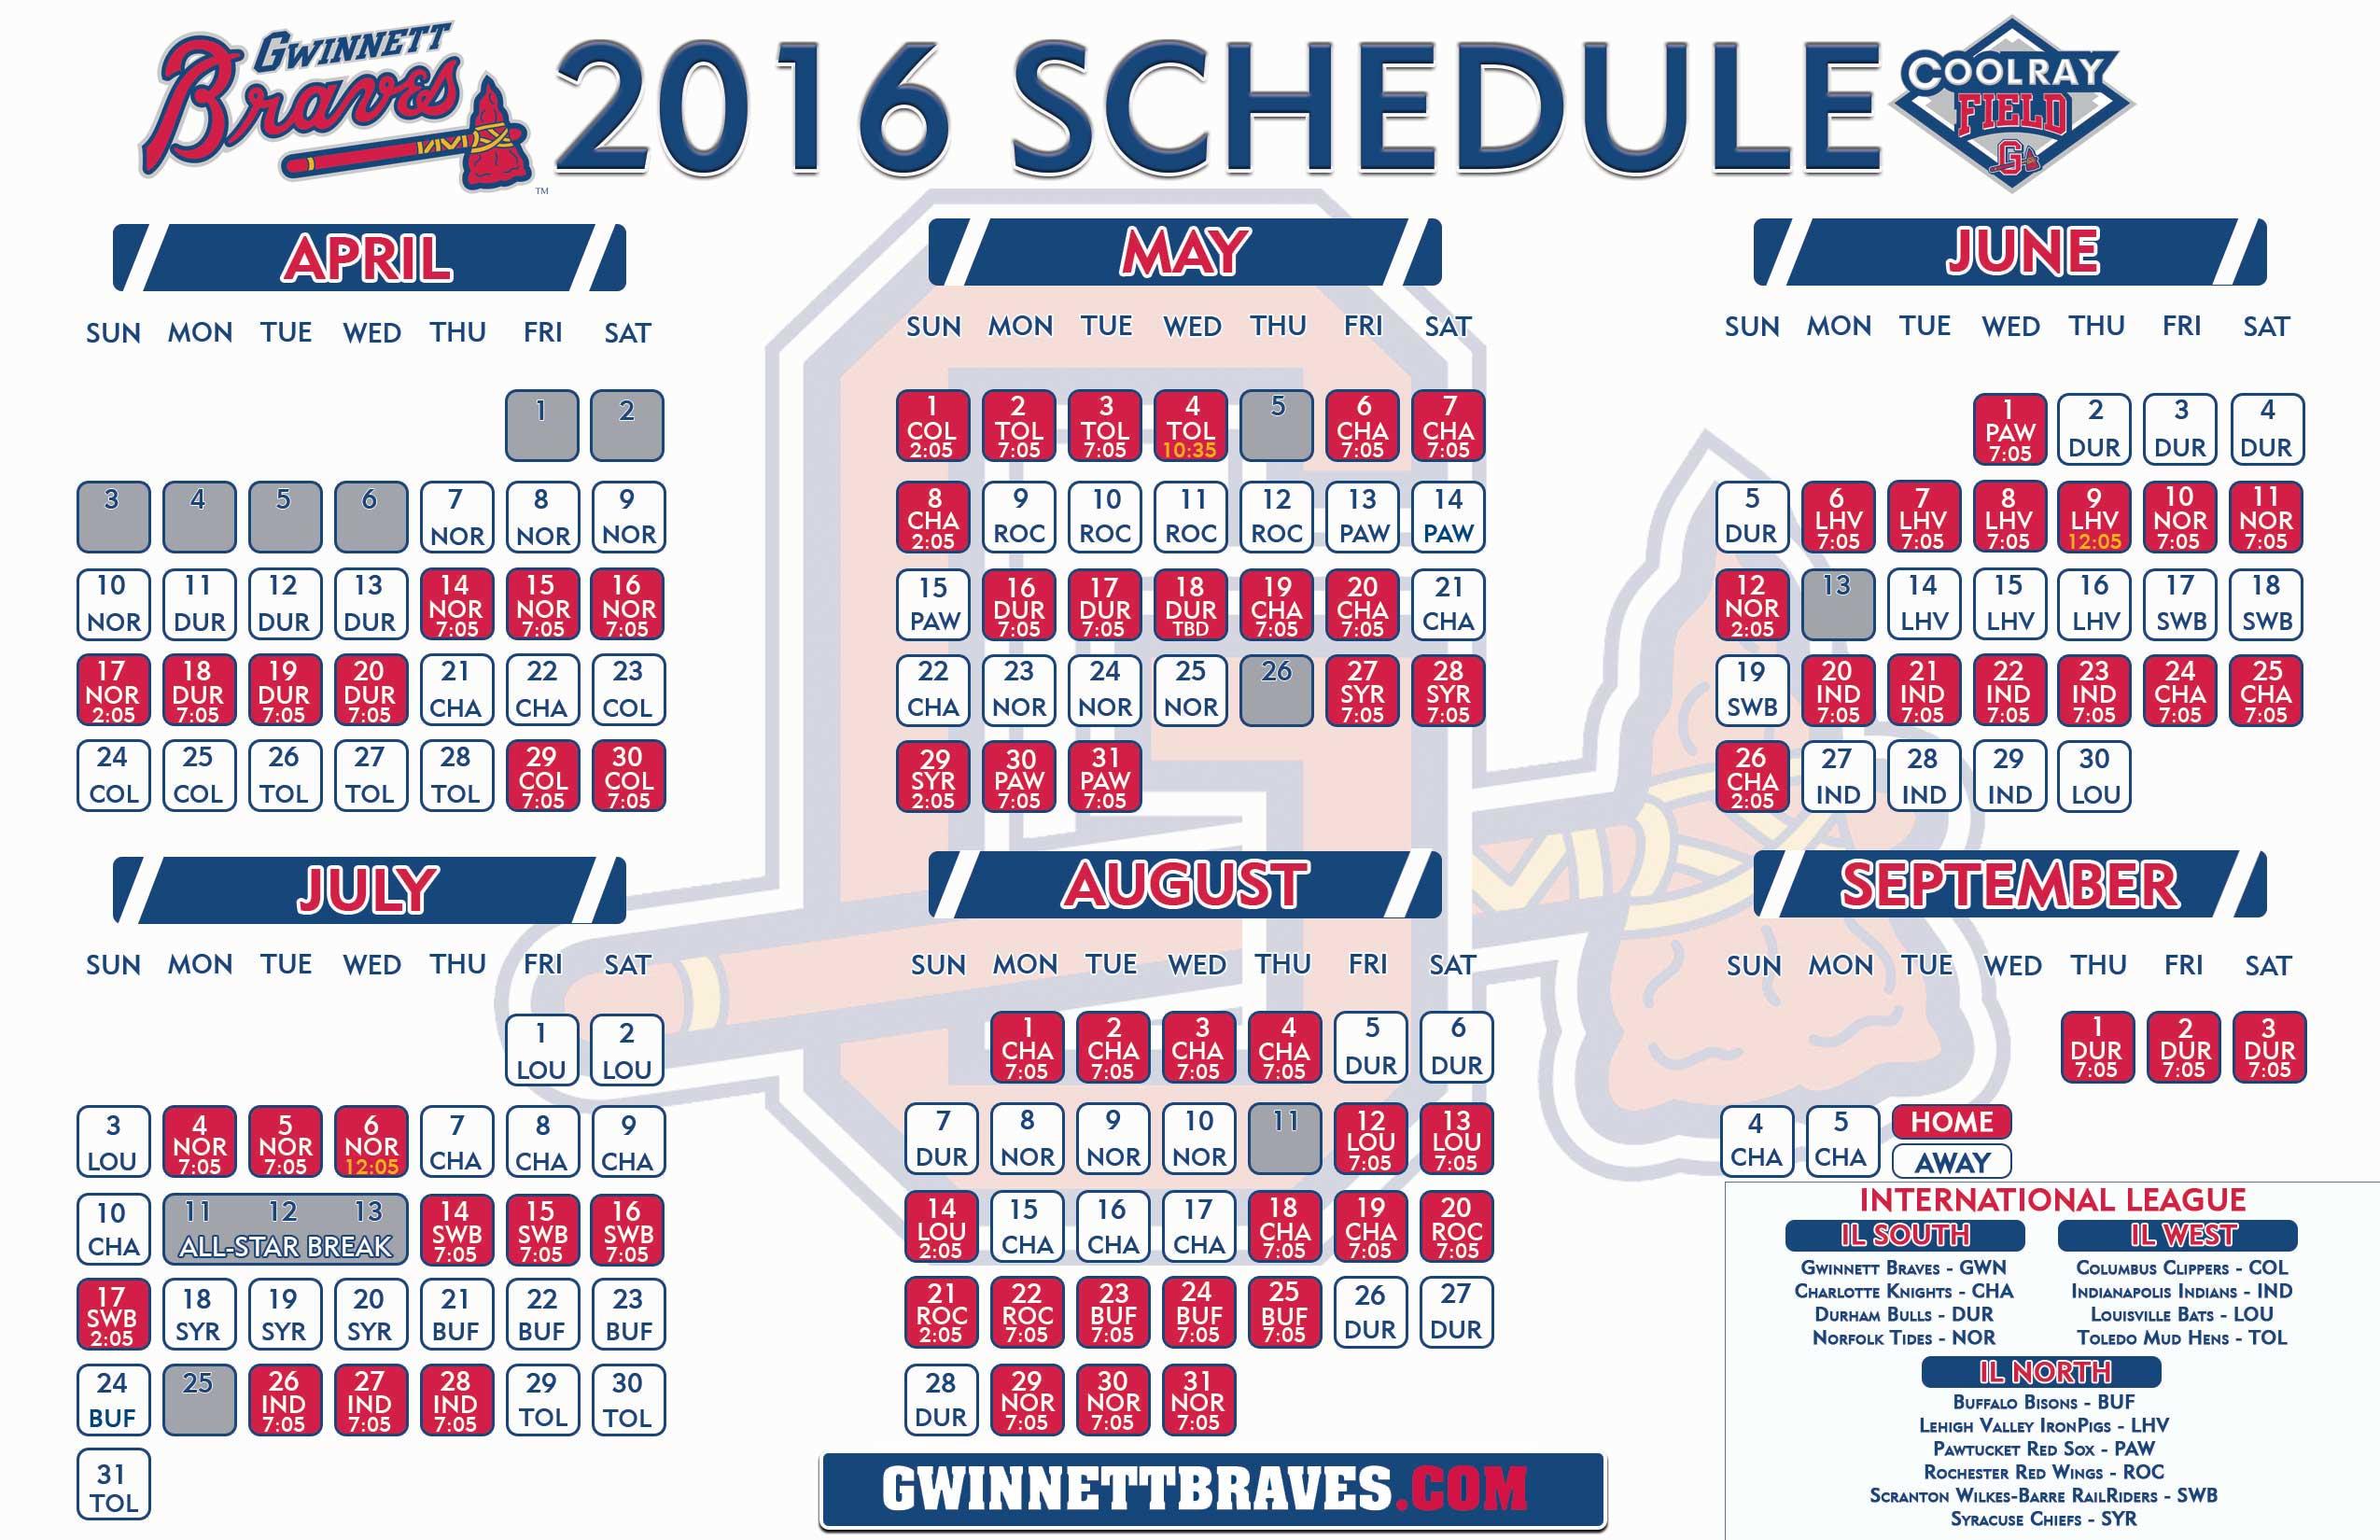 Gwinnett Braves 2019 Schedule Gwinnett Braves Announce 2016 Schedule | Gwinnett Stripers News